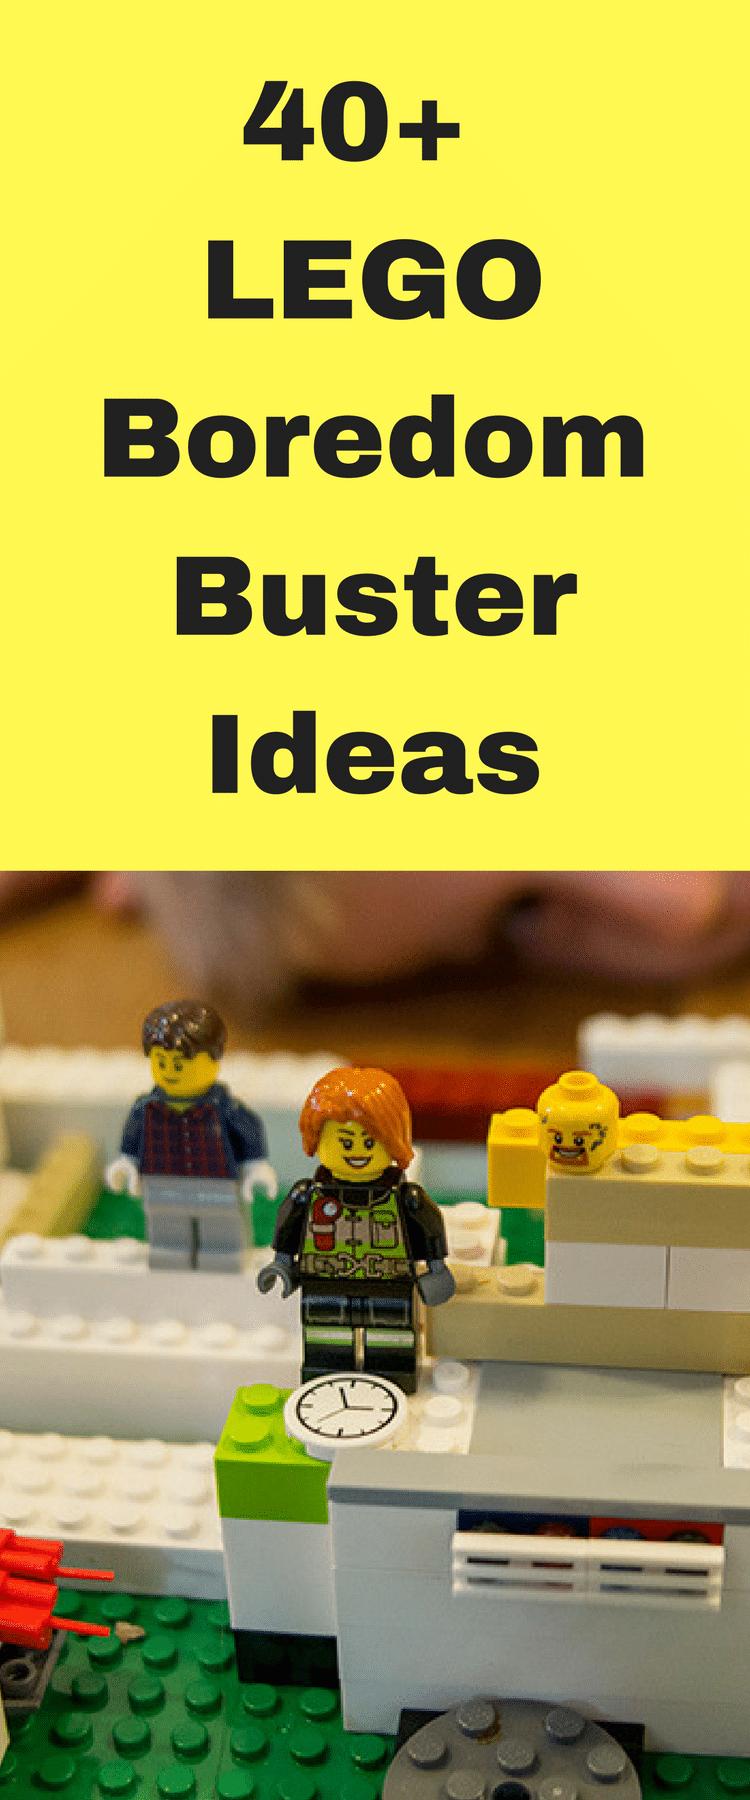 LEGO / LEGO Ideas / LEGO Crafts / LEGO Boredom Busters / Summer Ideas / Summer Fun via @clarkscondensed